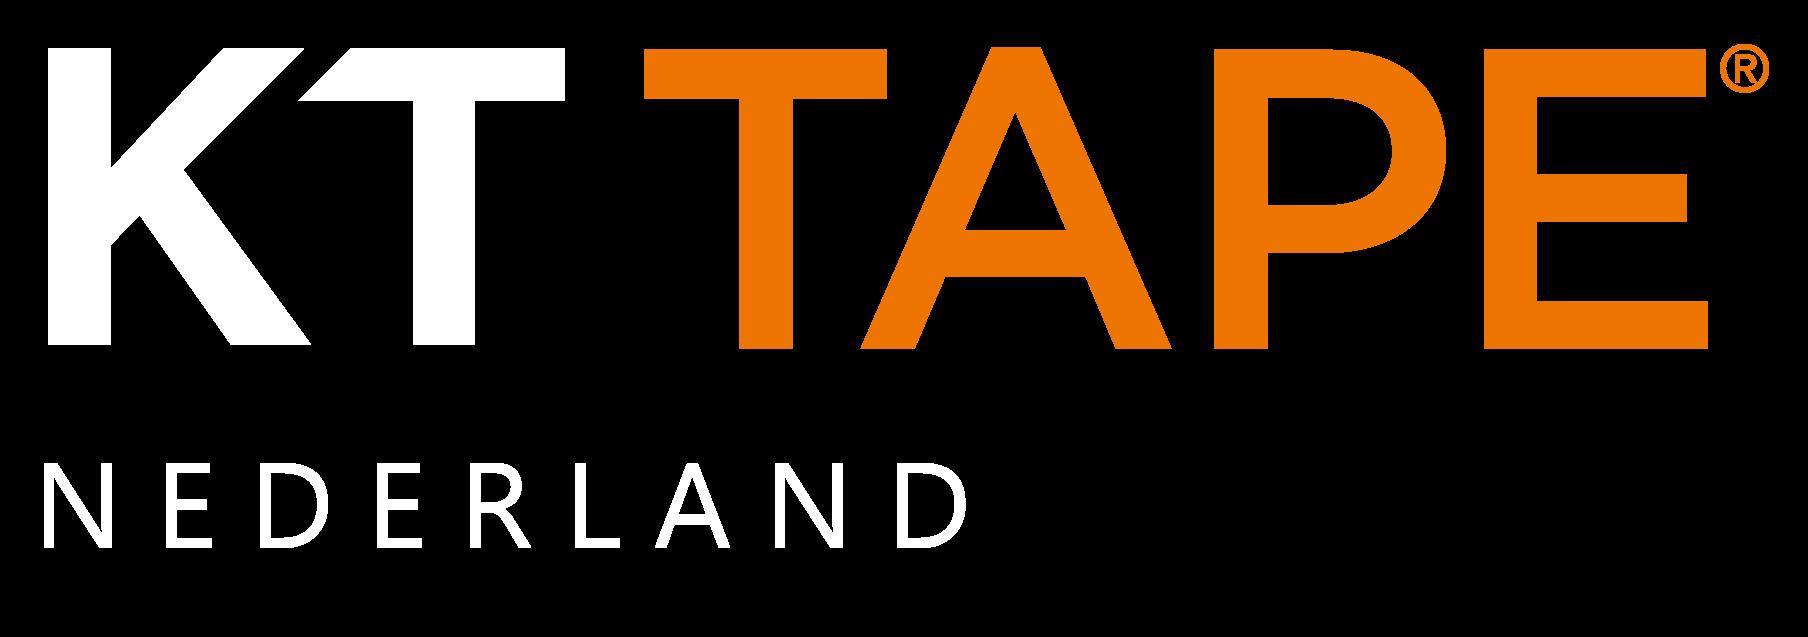 KTTAPE NEDERLAND